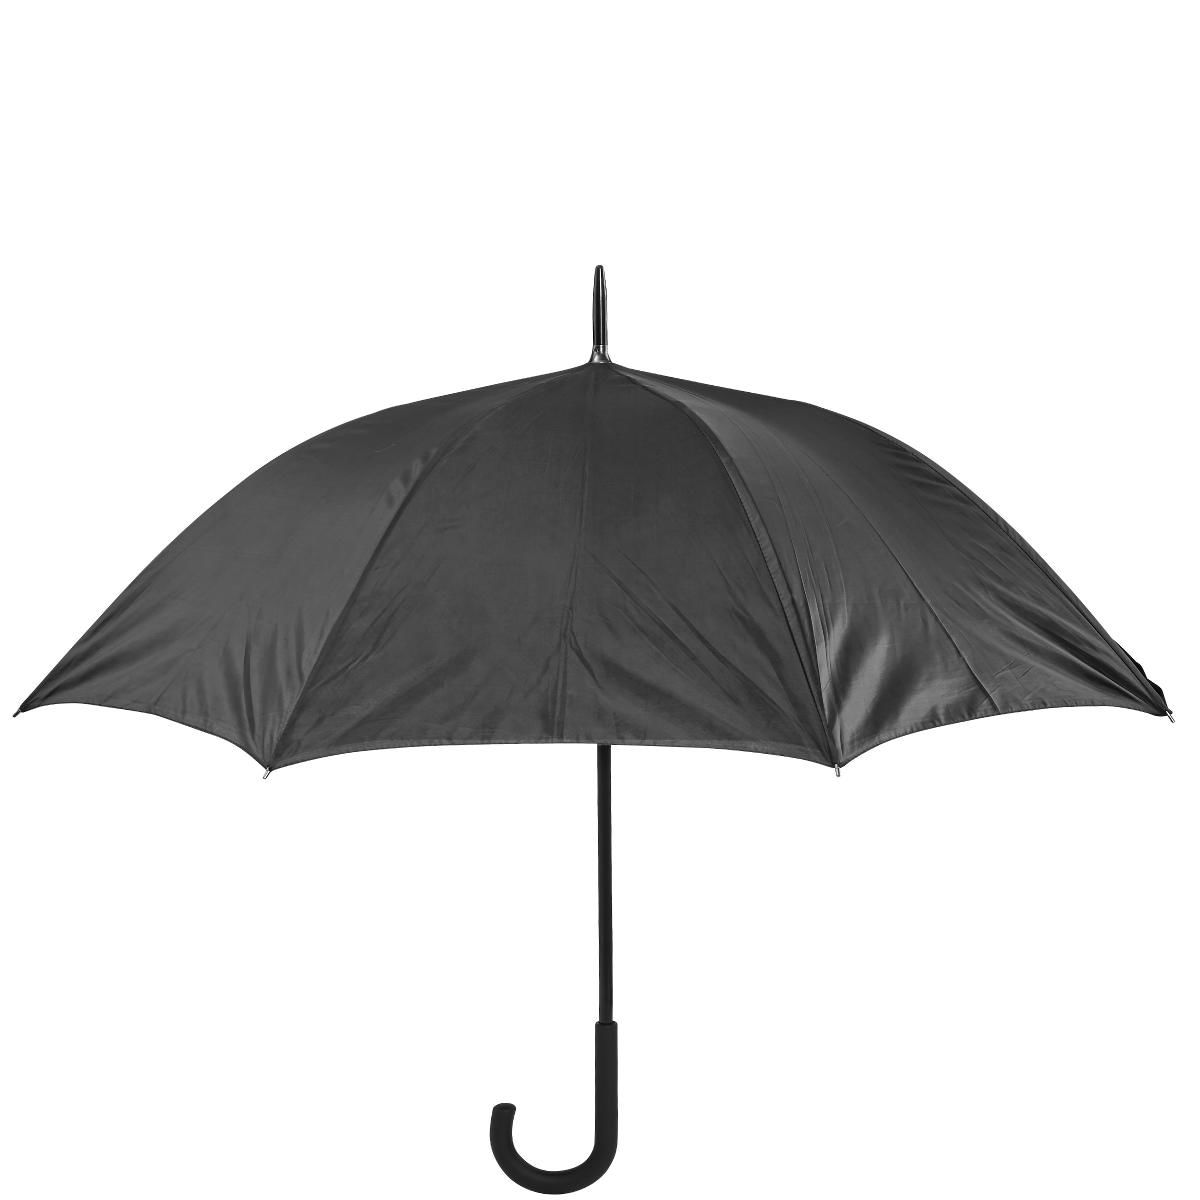 Butlers Hamburg Regenschirm Hamburg schwarz